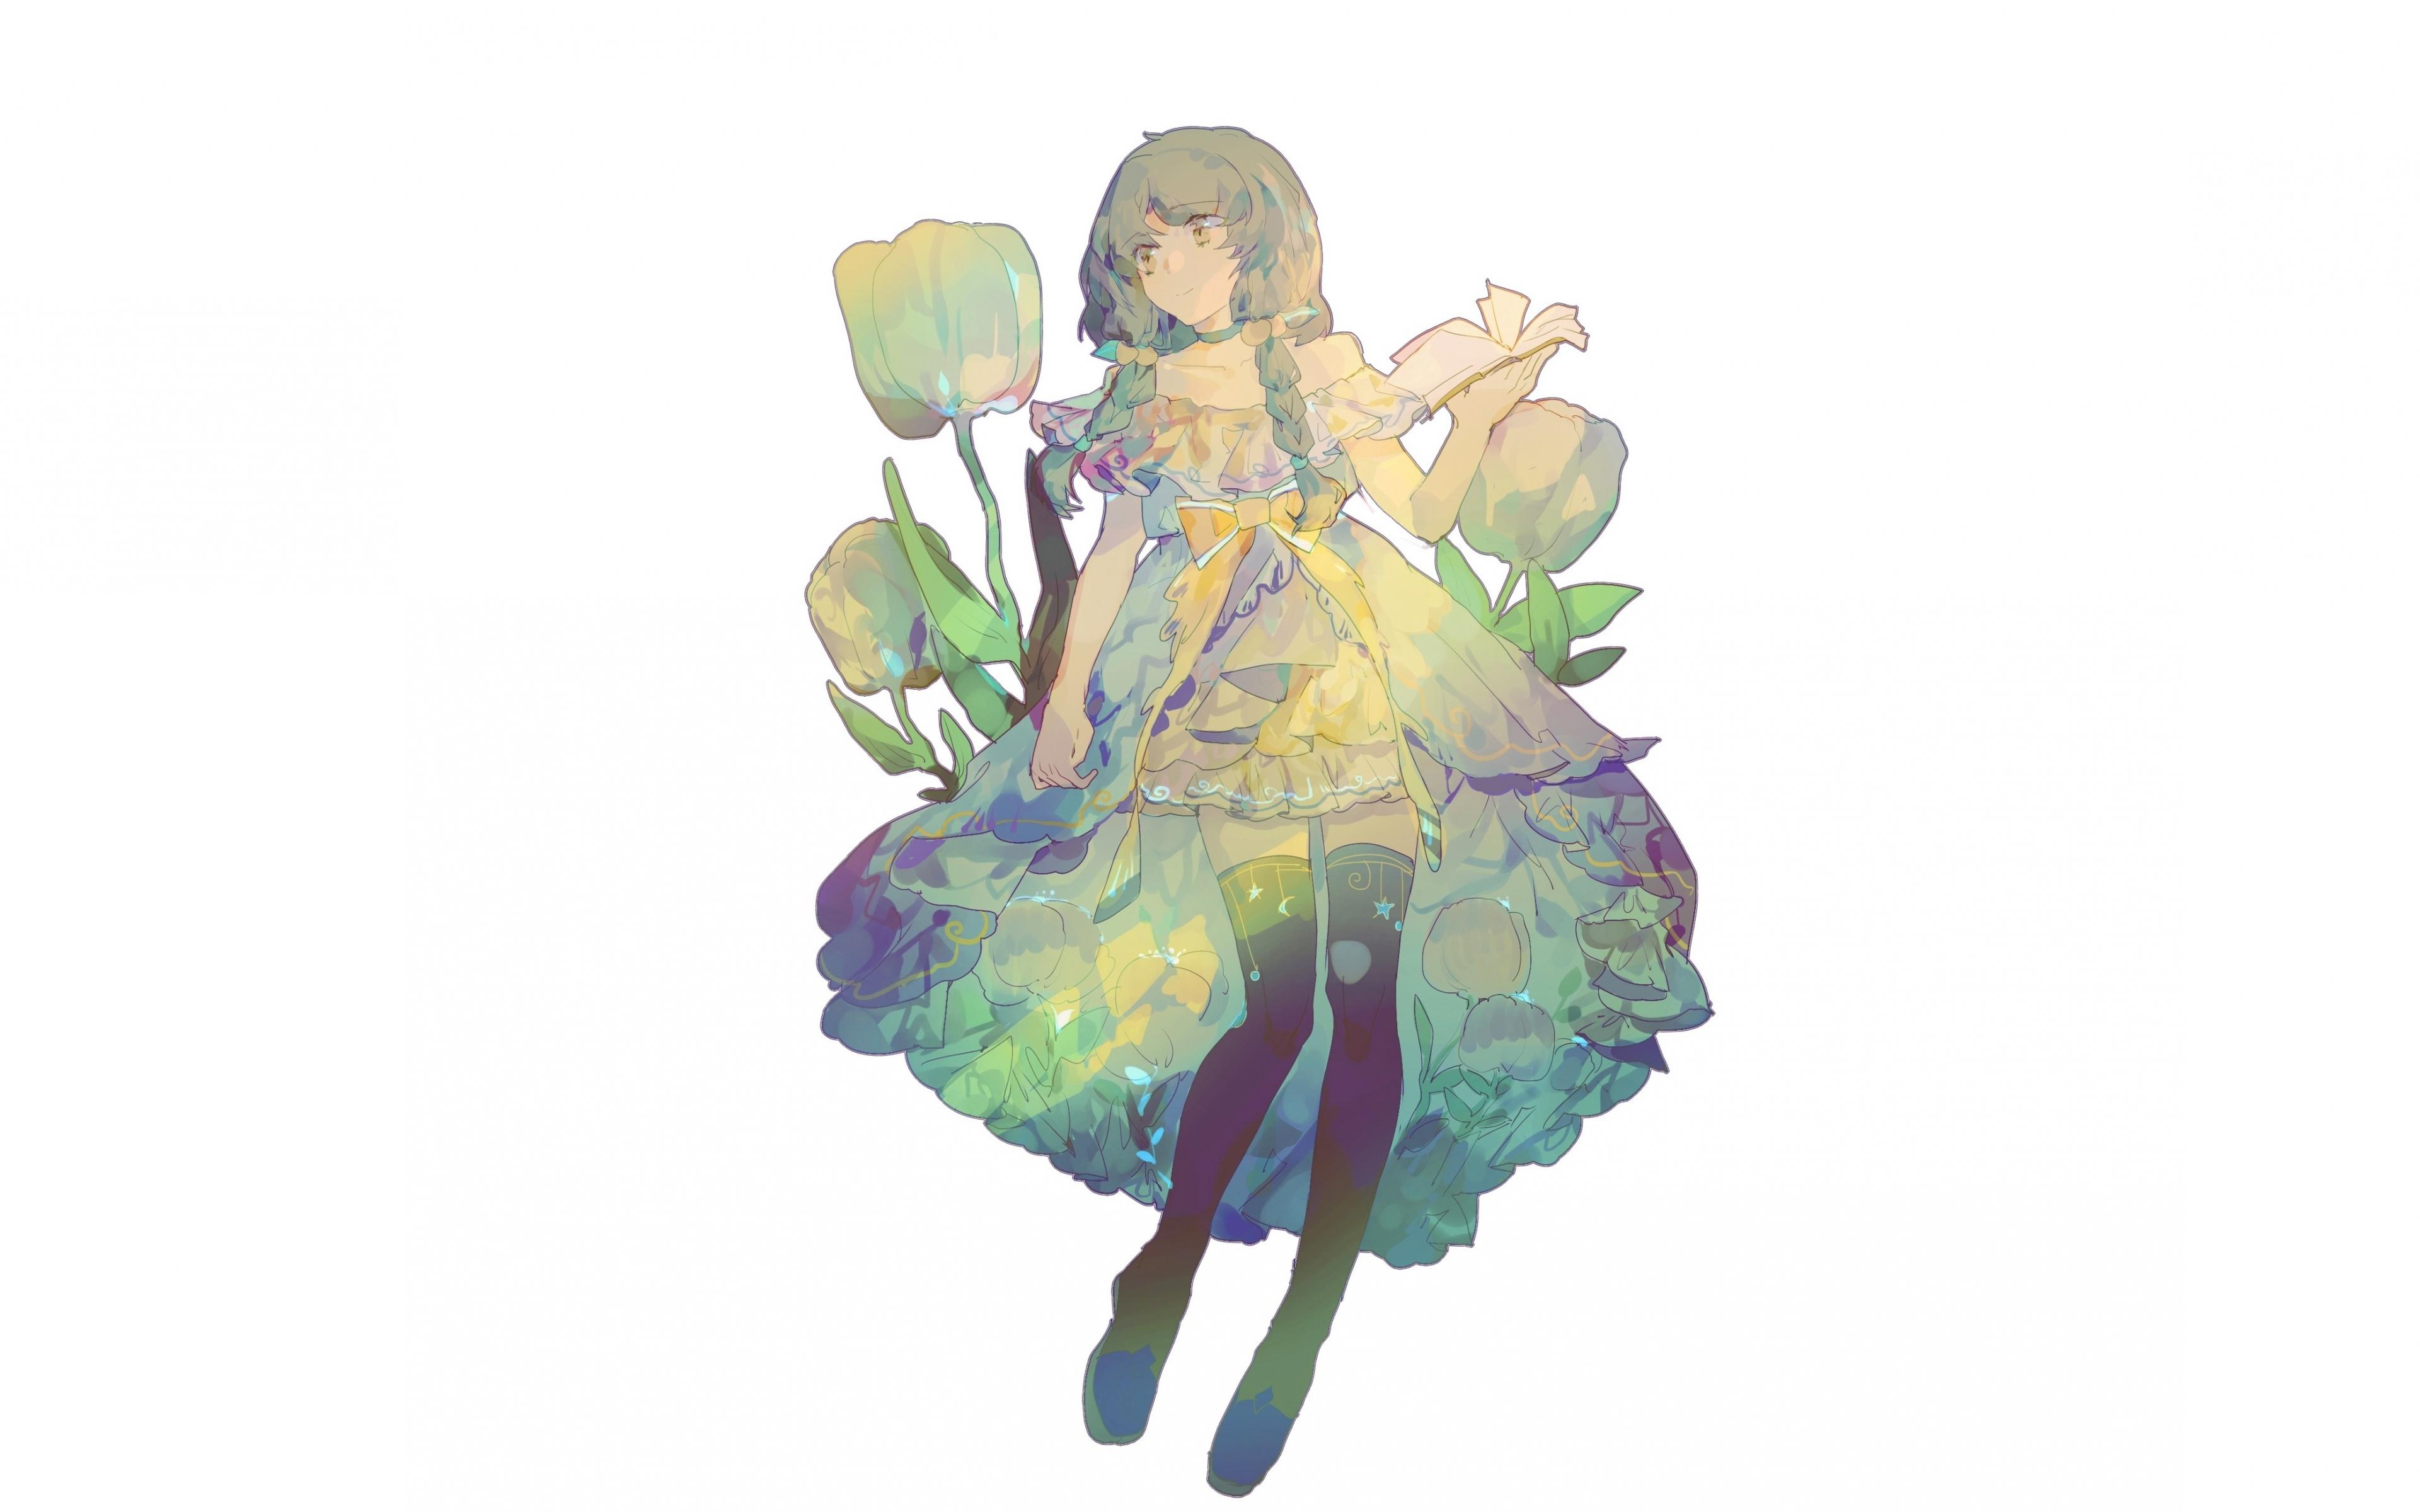 Download 3840x2400 Wallpaper Artwork Beautiful And Cute Anime Girl 4k Ultra Hd 16 10 Widescreen 3840x2400 Hd Image Background 6632